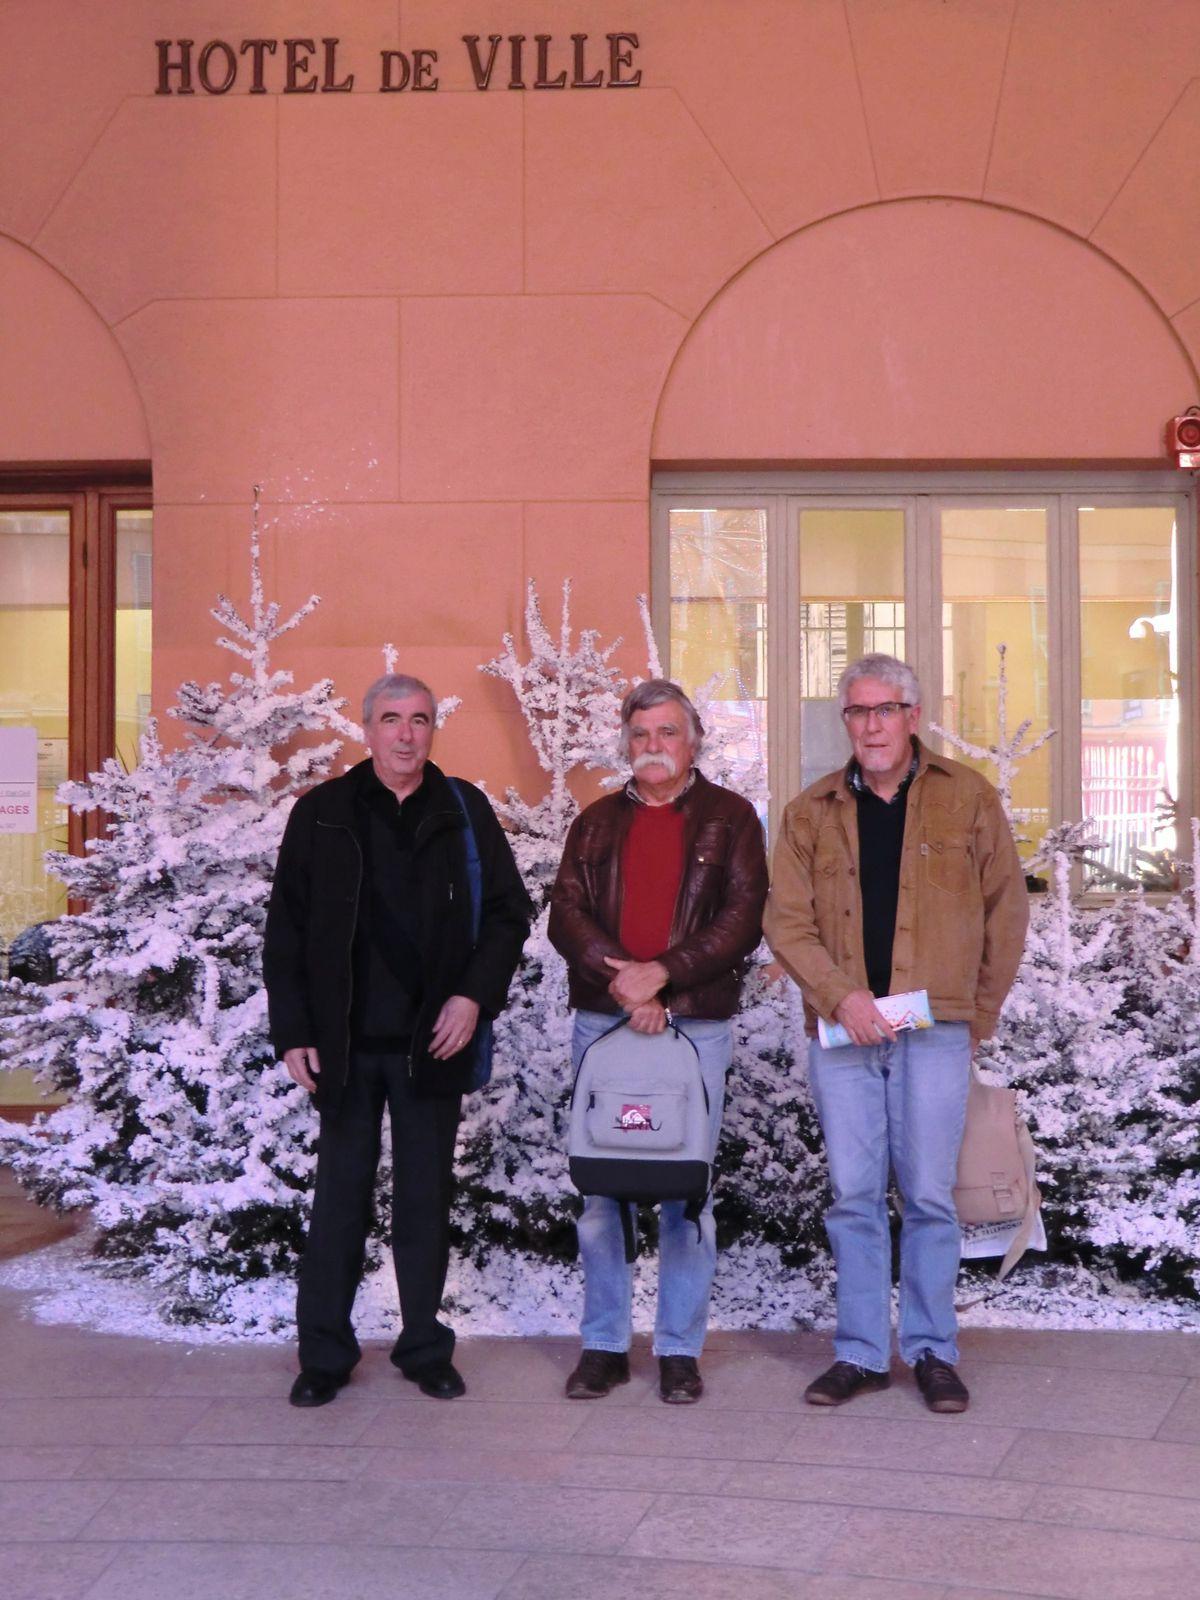 L'Intersyndicale recue à la mairie de NICE